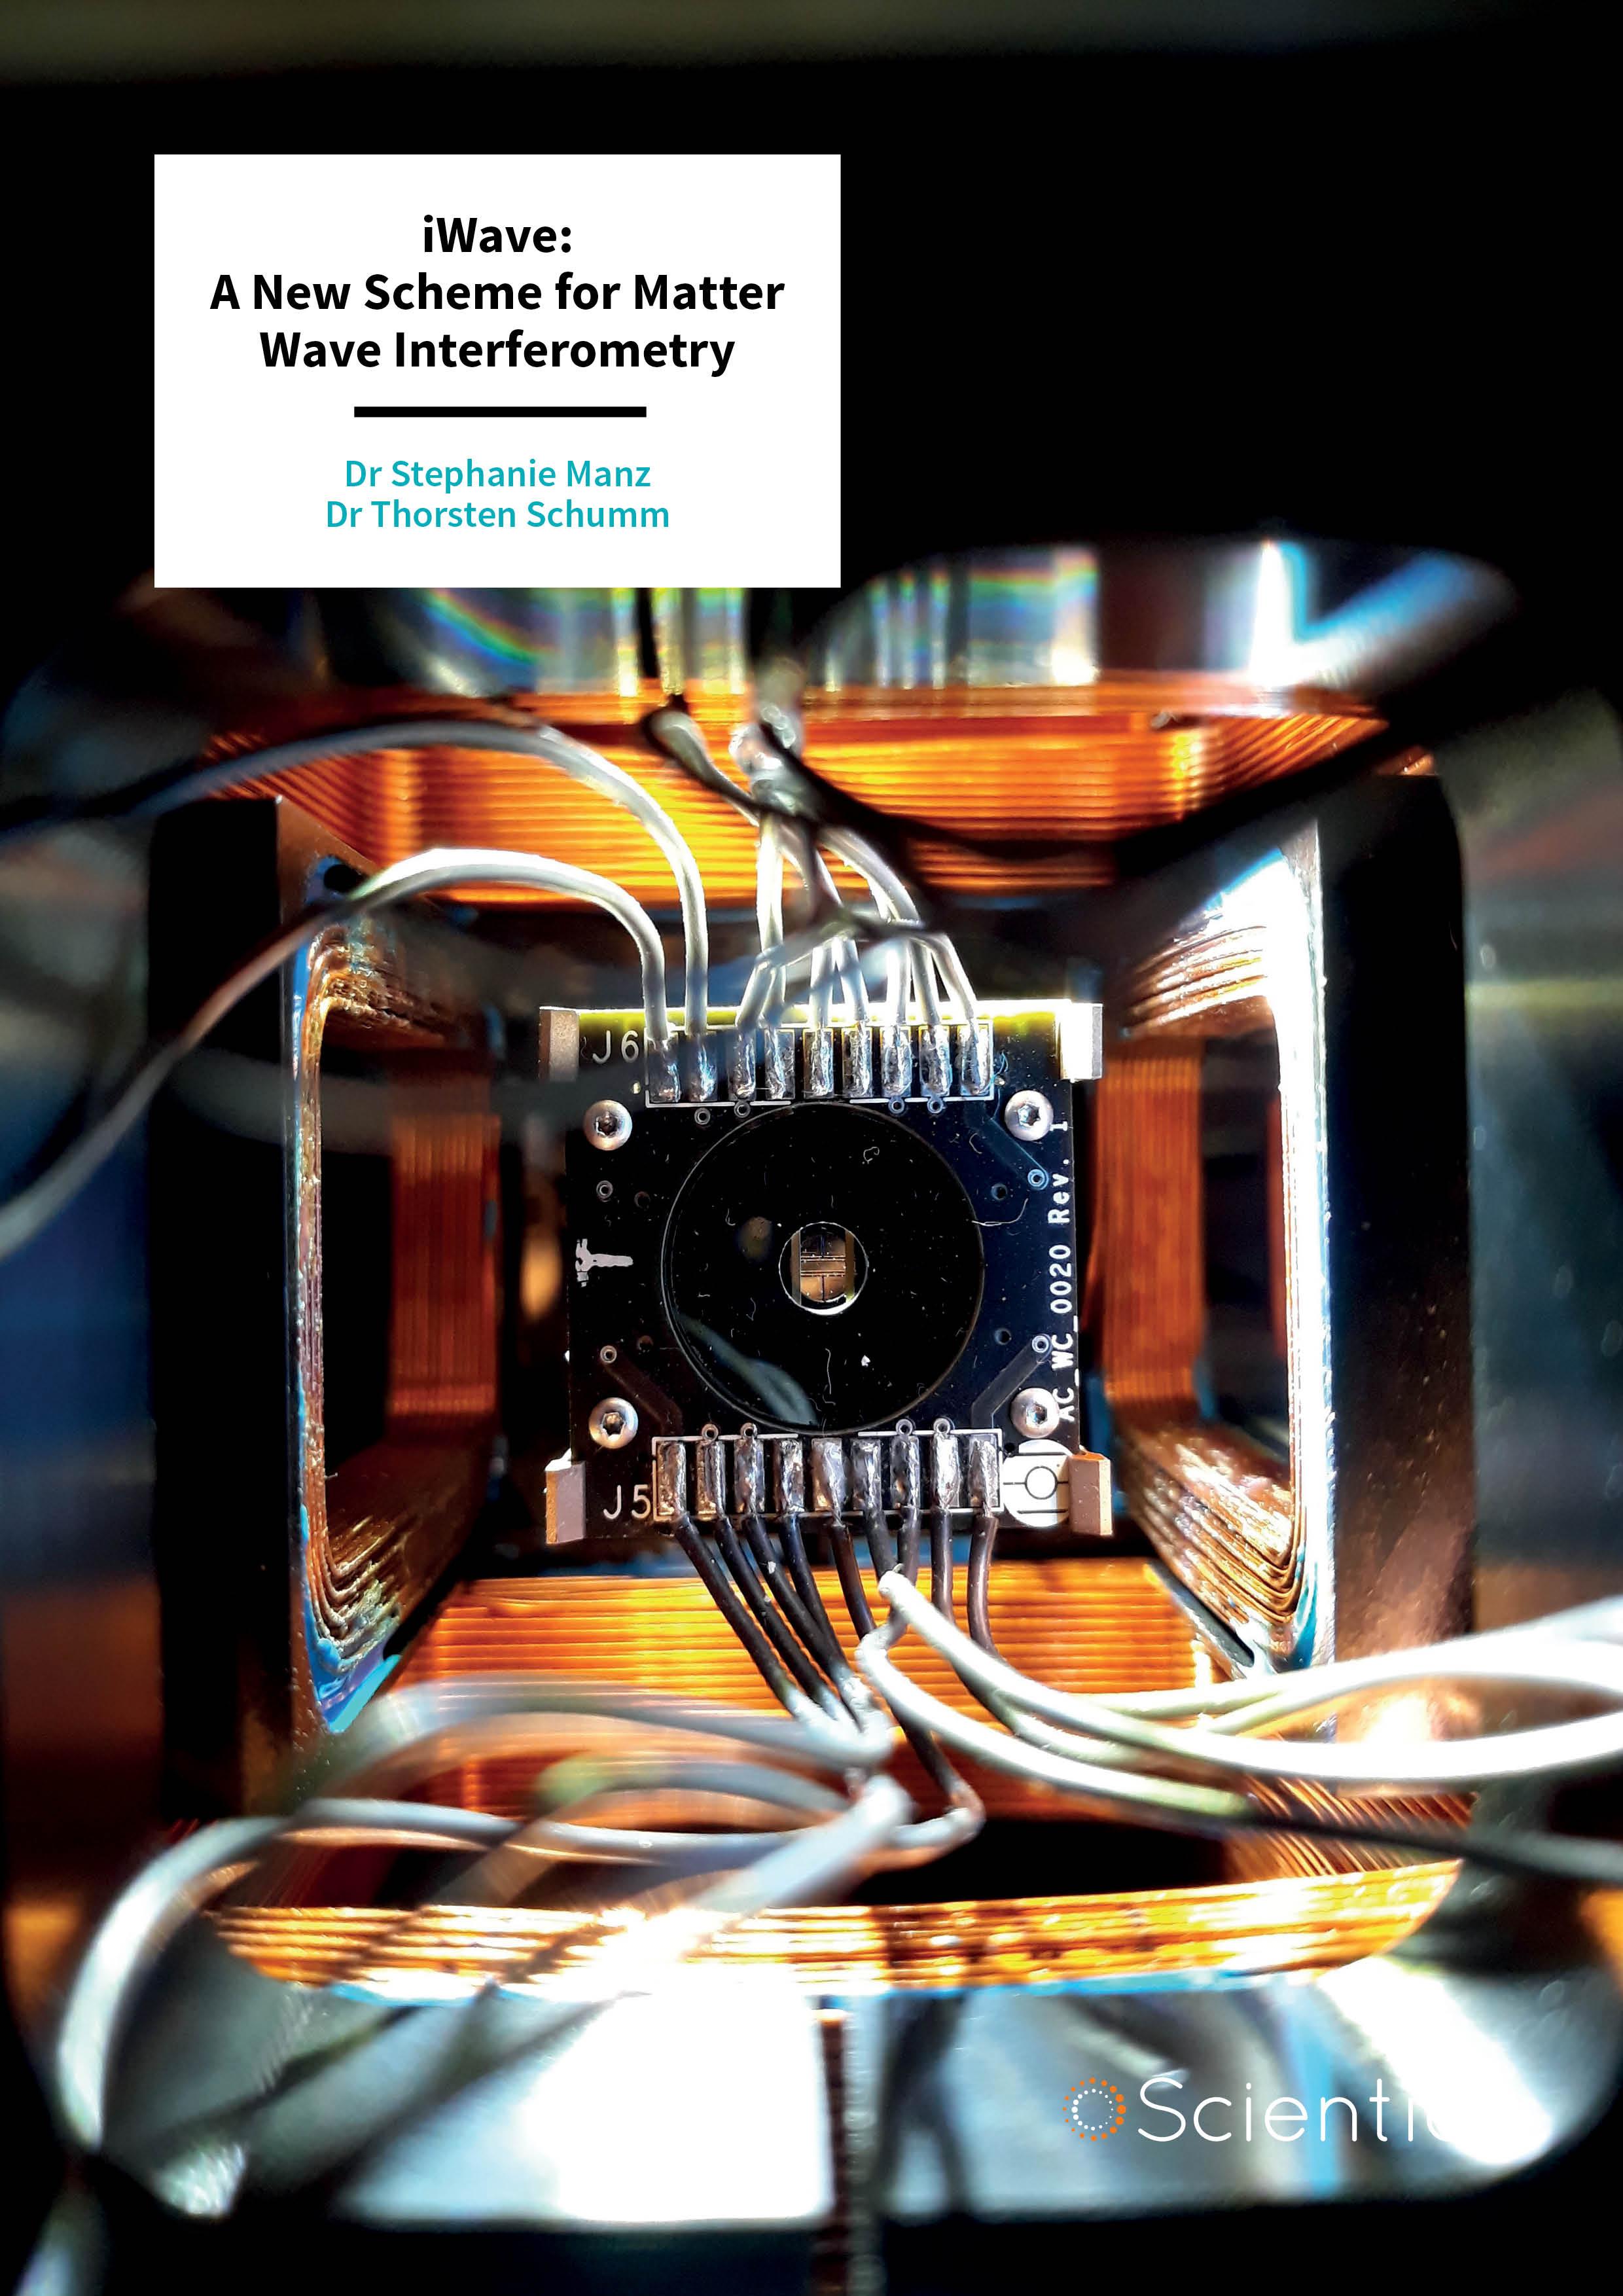 Dr Stephanie Manz and Dr Thorsten Schumm – iWave: A New Scheme for Matter Wave Interferometry